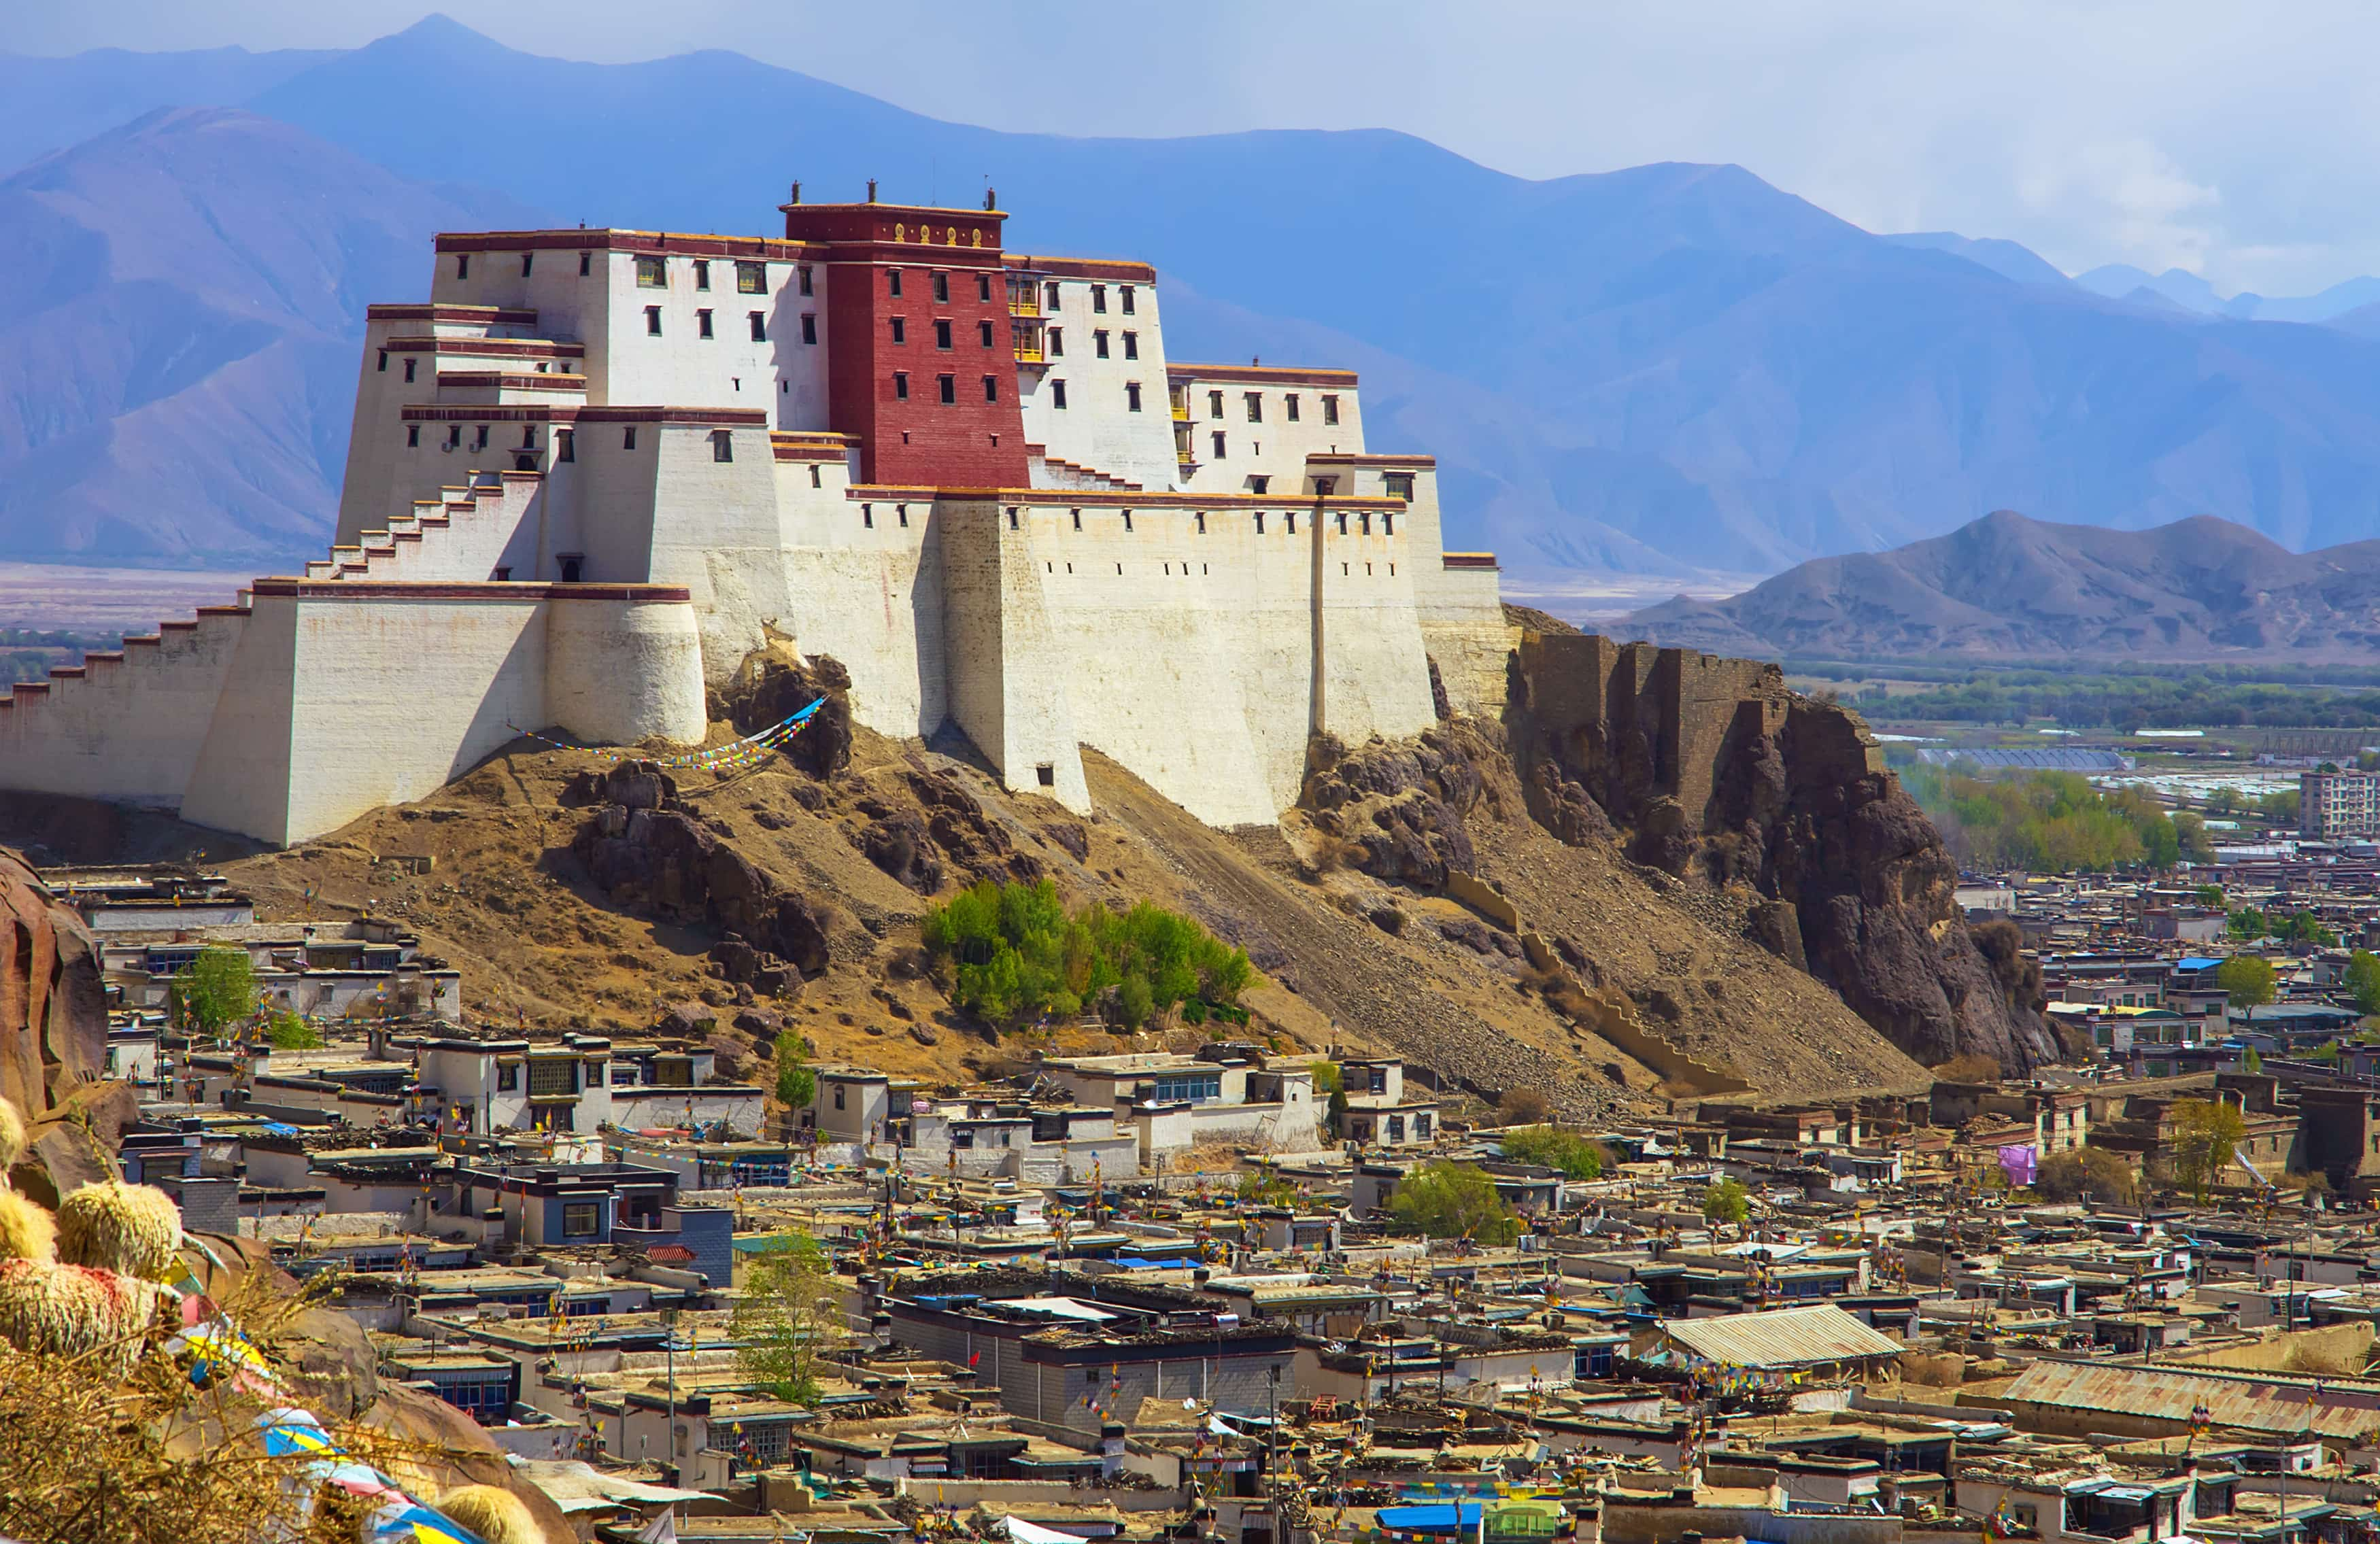 Copy of Potala Palace in Shigatse, Tibet